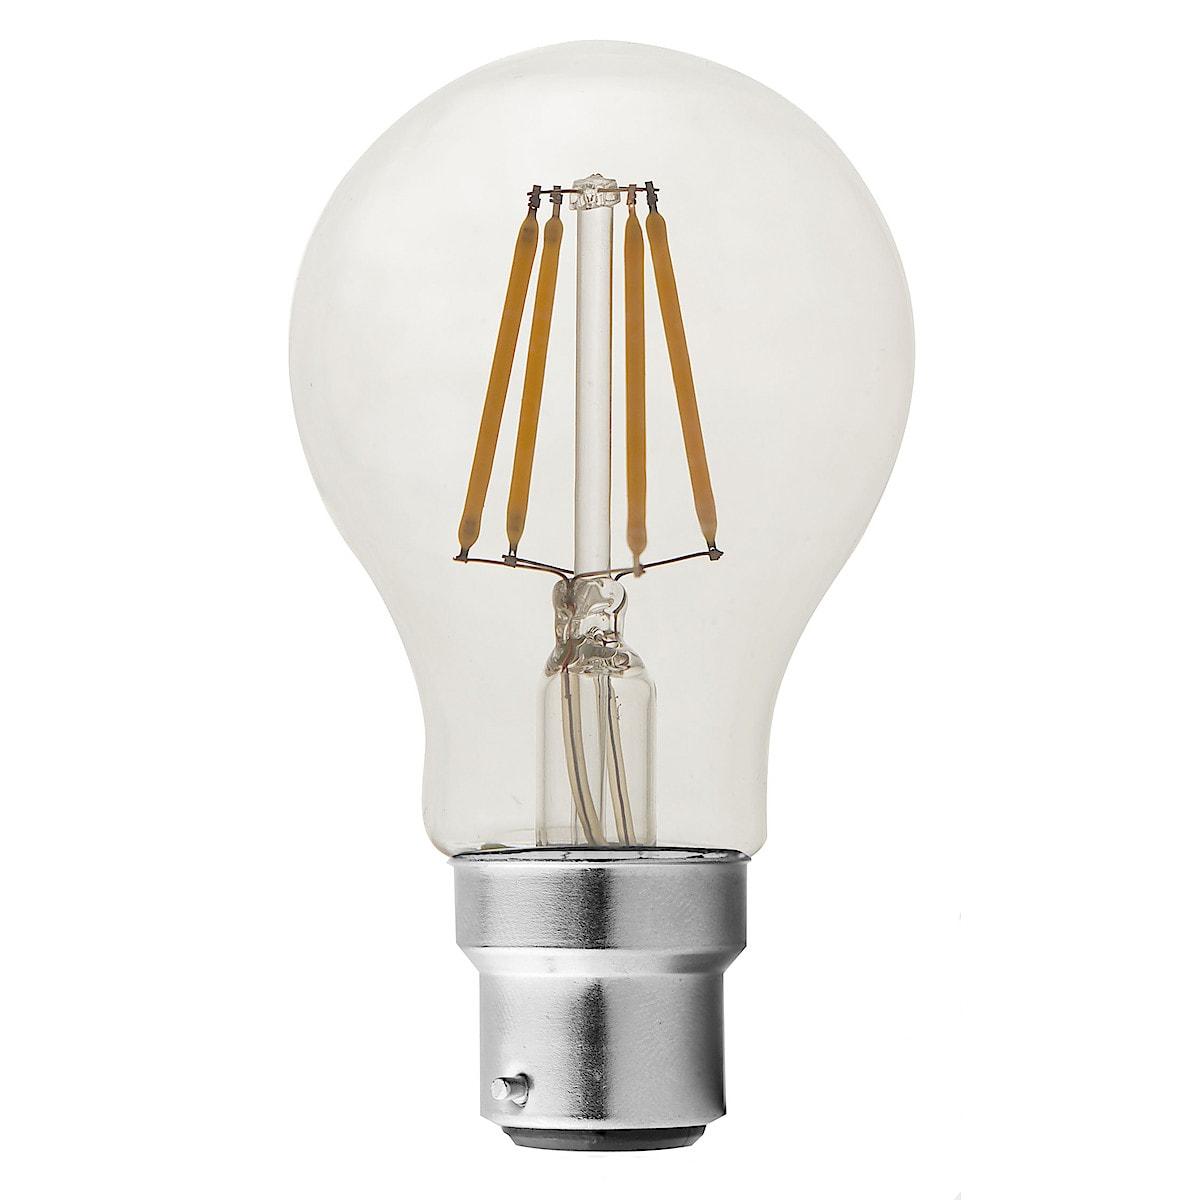 Clas Ohlson B22 Dimmable LED GLS Bulb